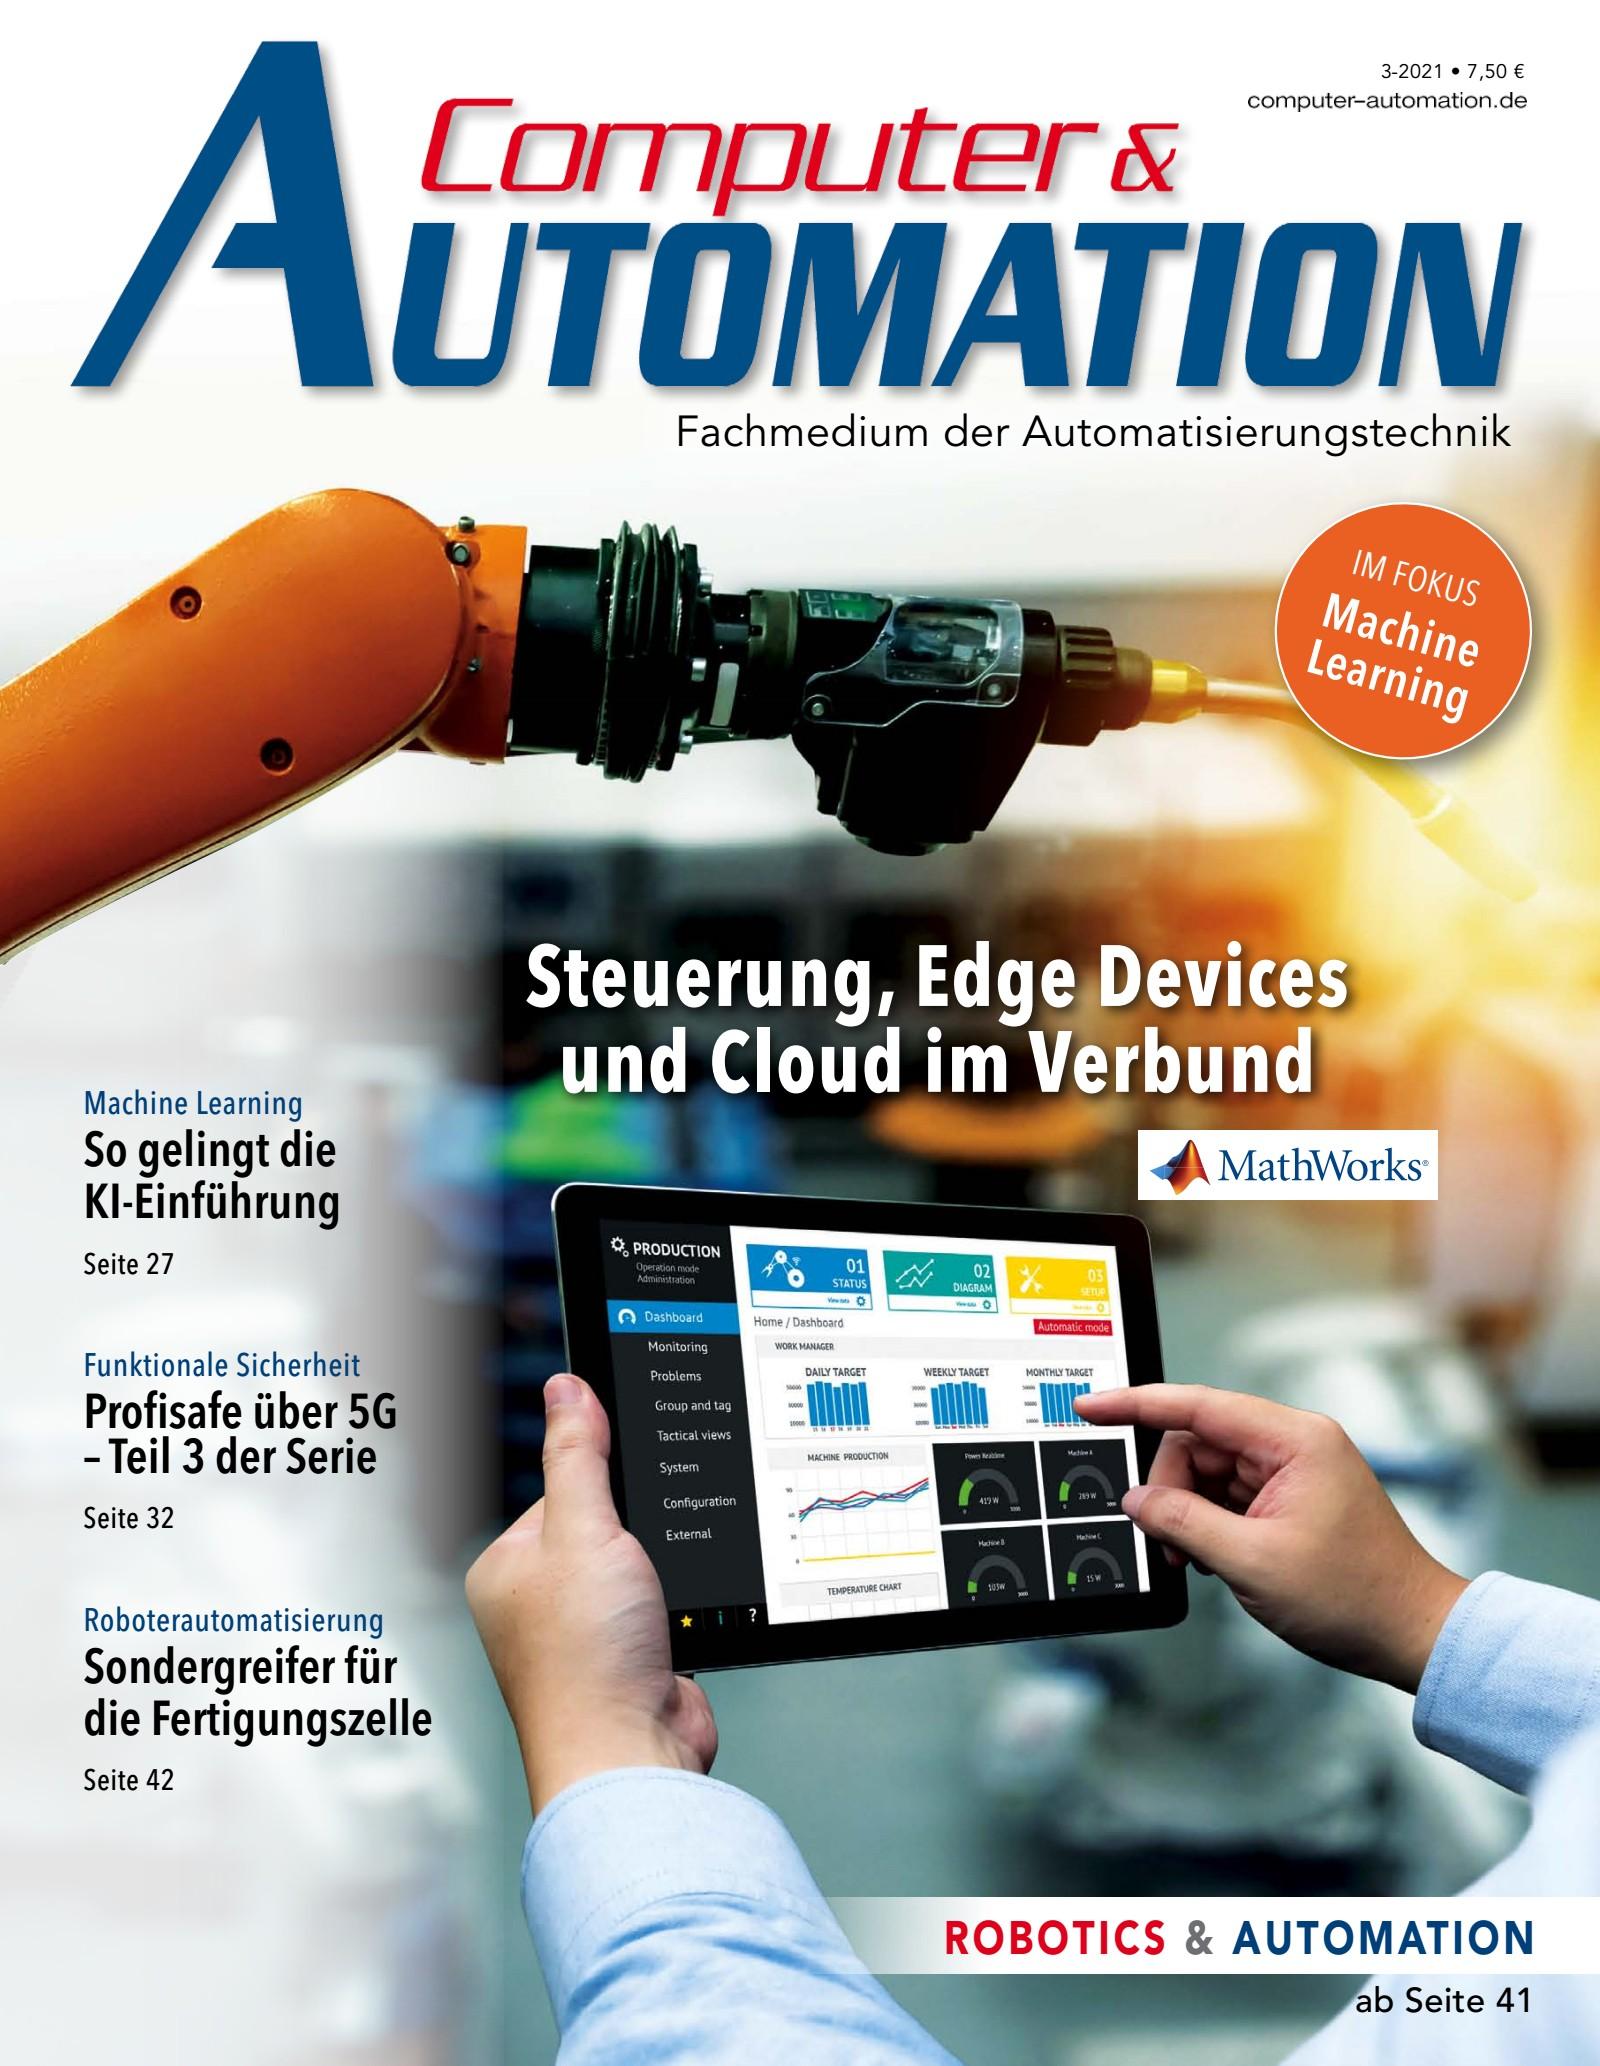 Computer&AUTOMATION 03/2021 Digital